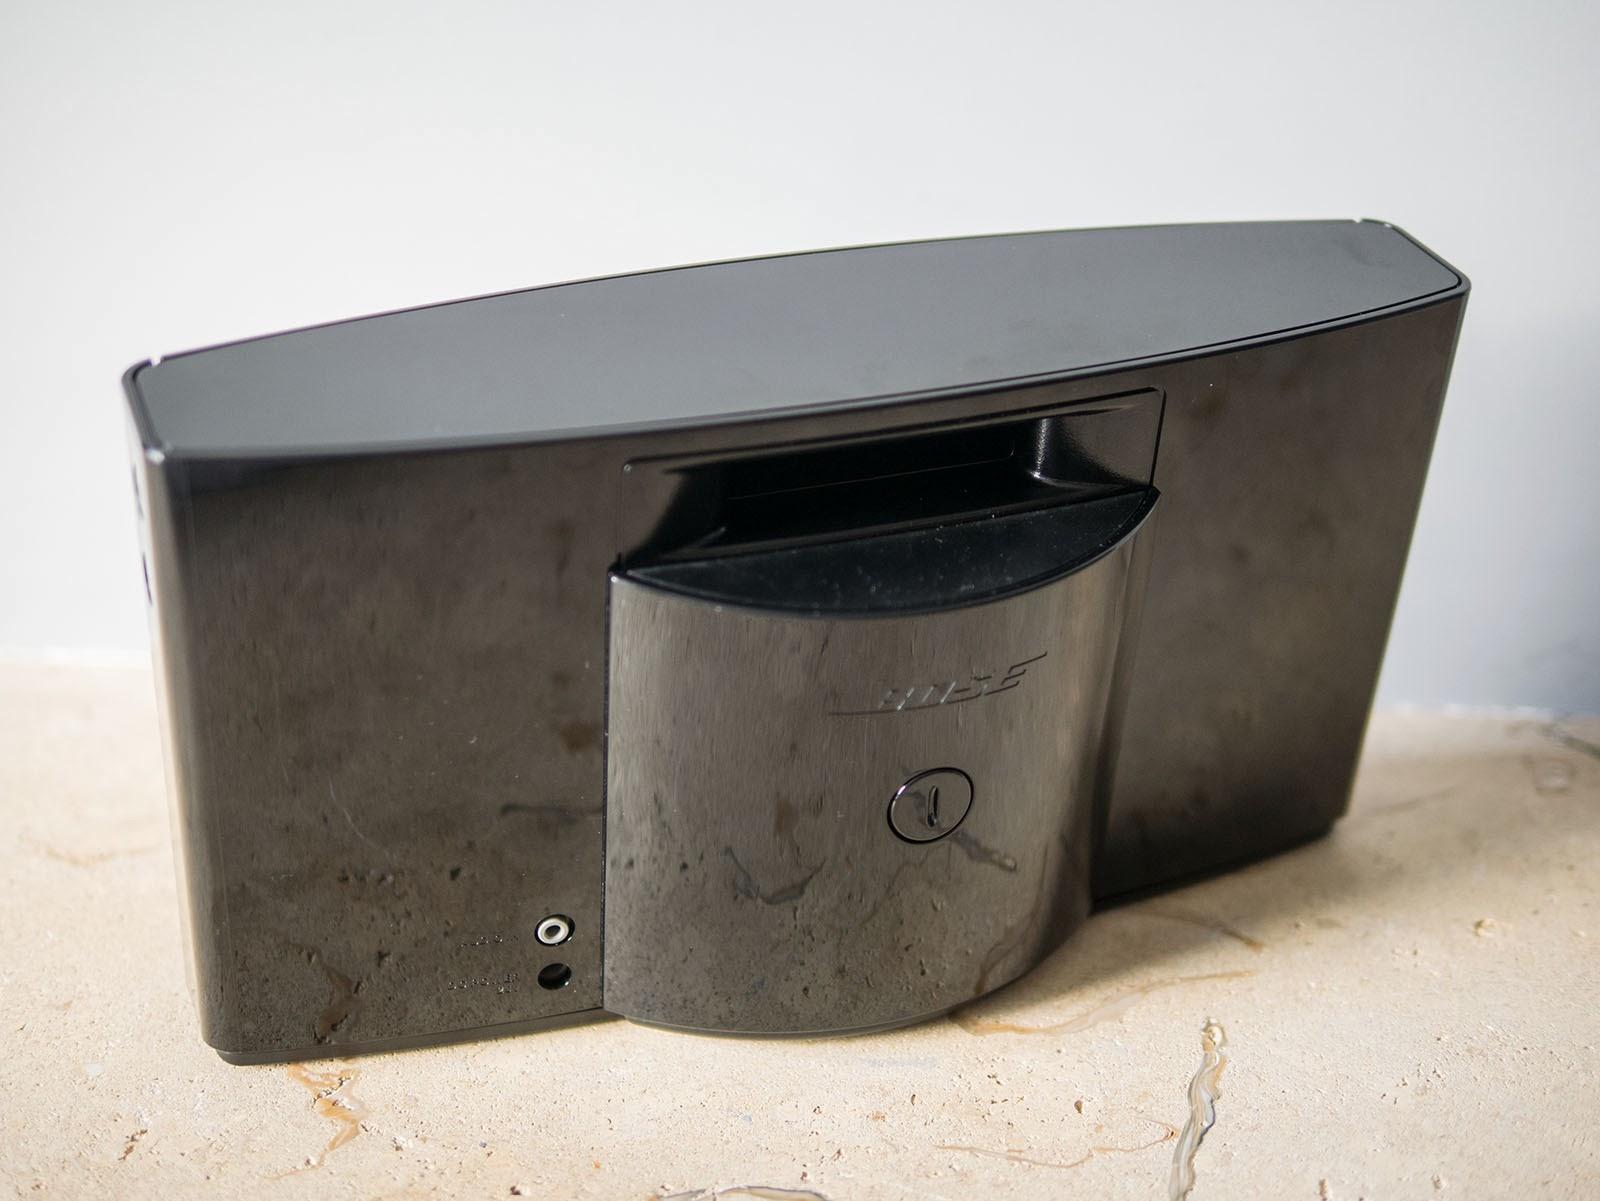 oluvu0027s gadgets